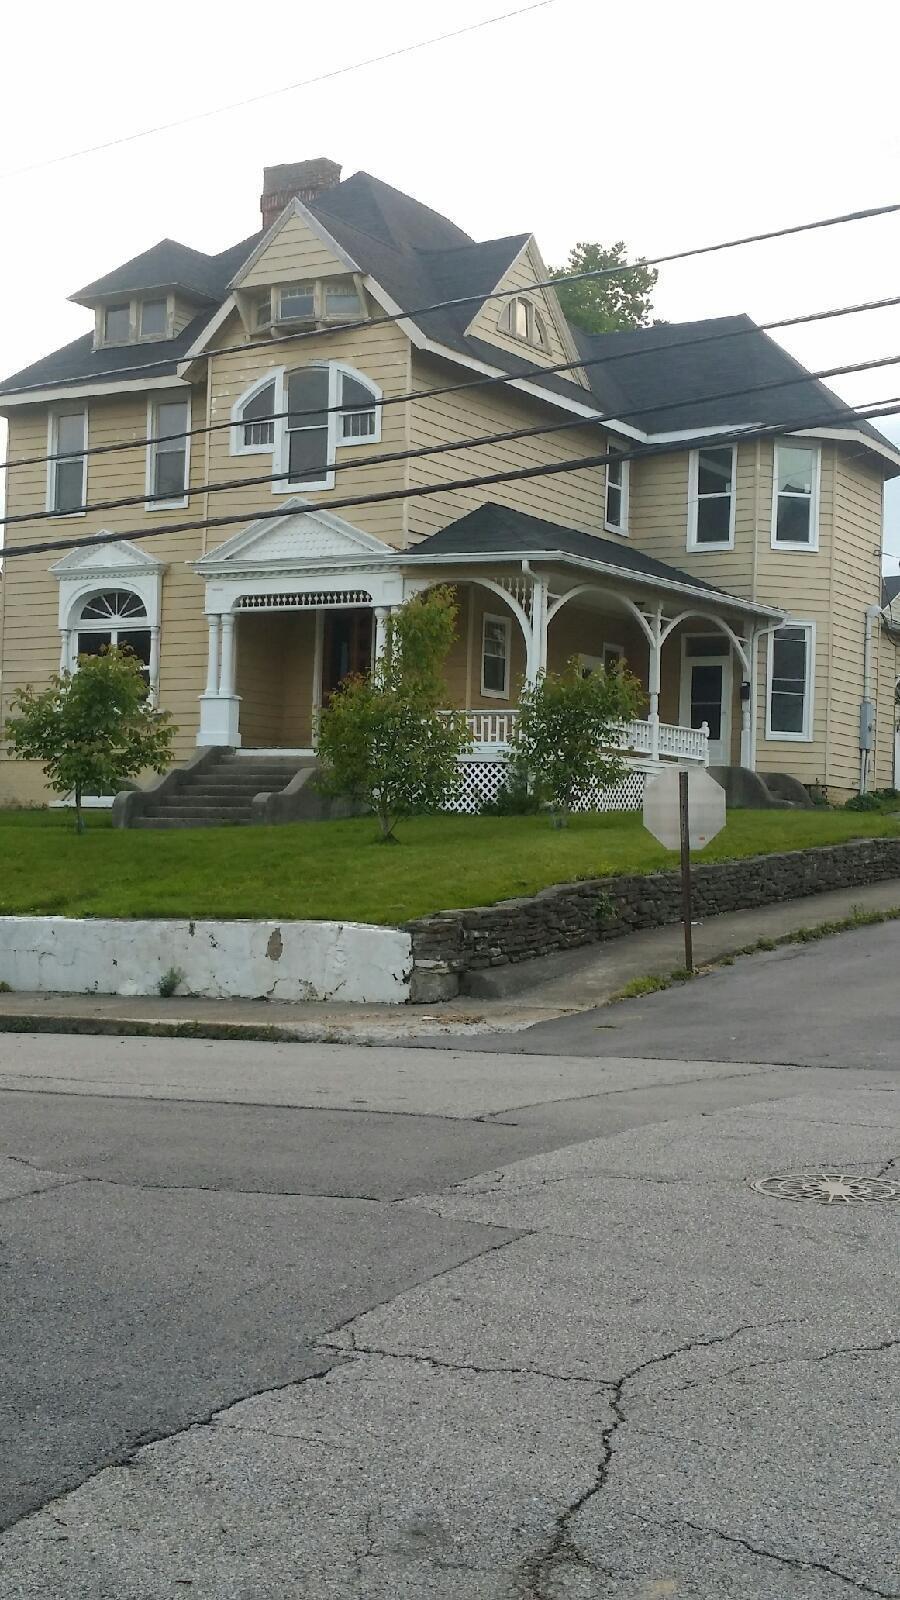 312 N Third Street, Richmond, KY | MLS# 1819916 | Delia Crumbaker